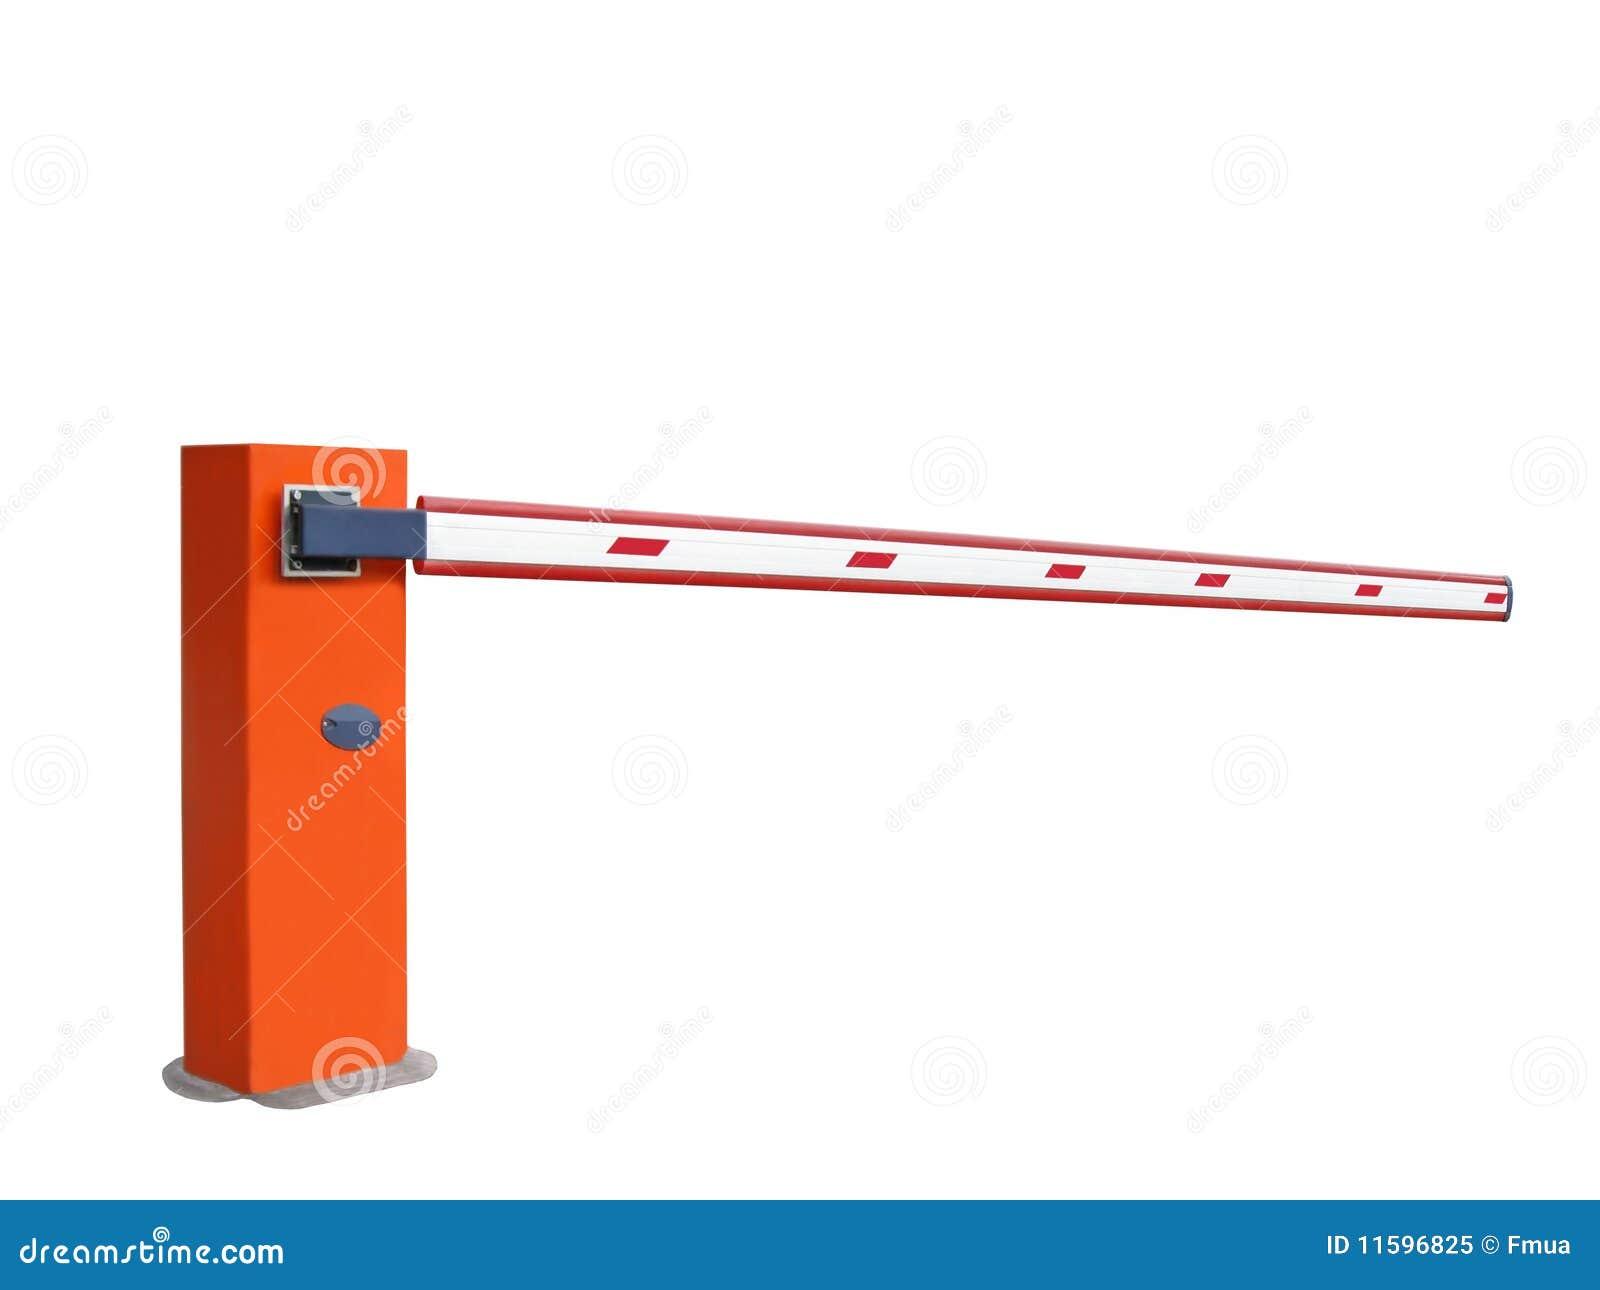 Closed orange entrance barrier nobody stop sign stock